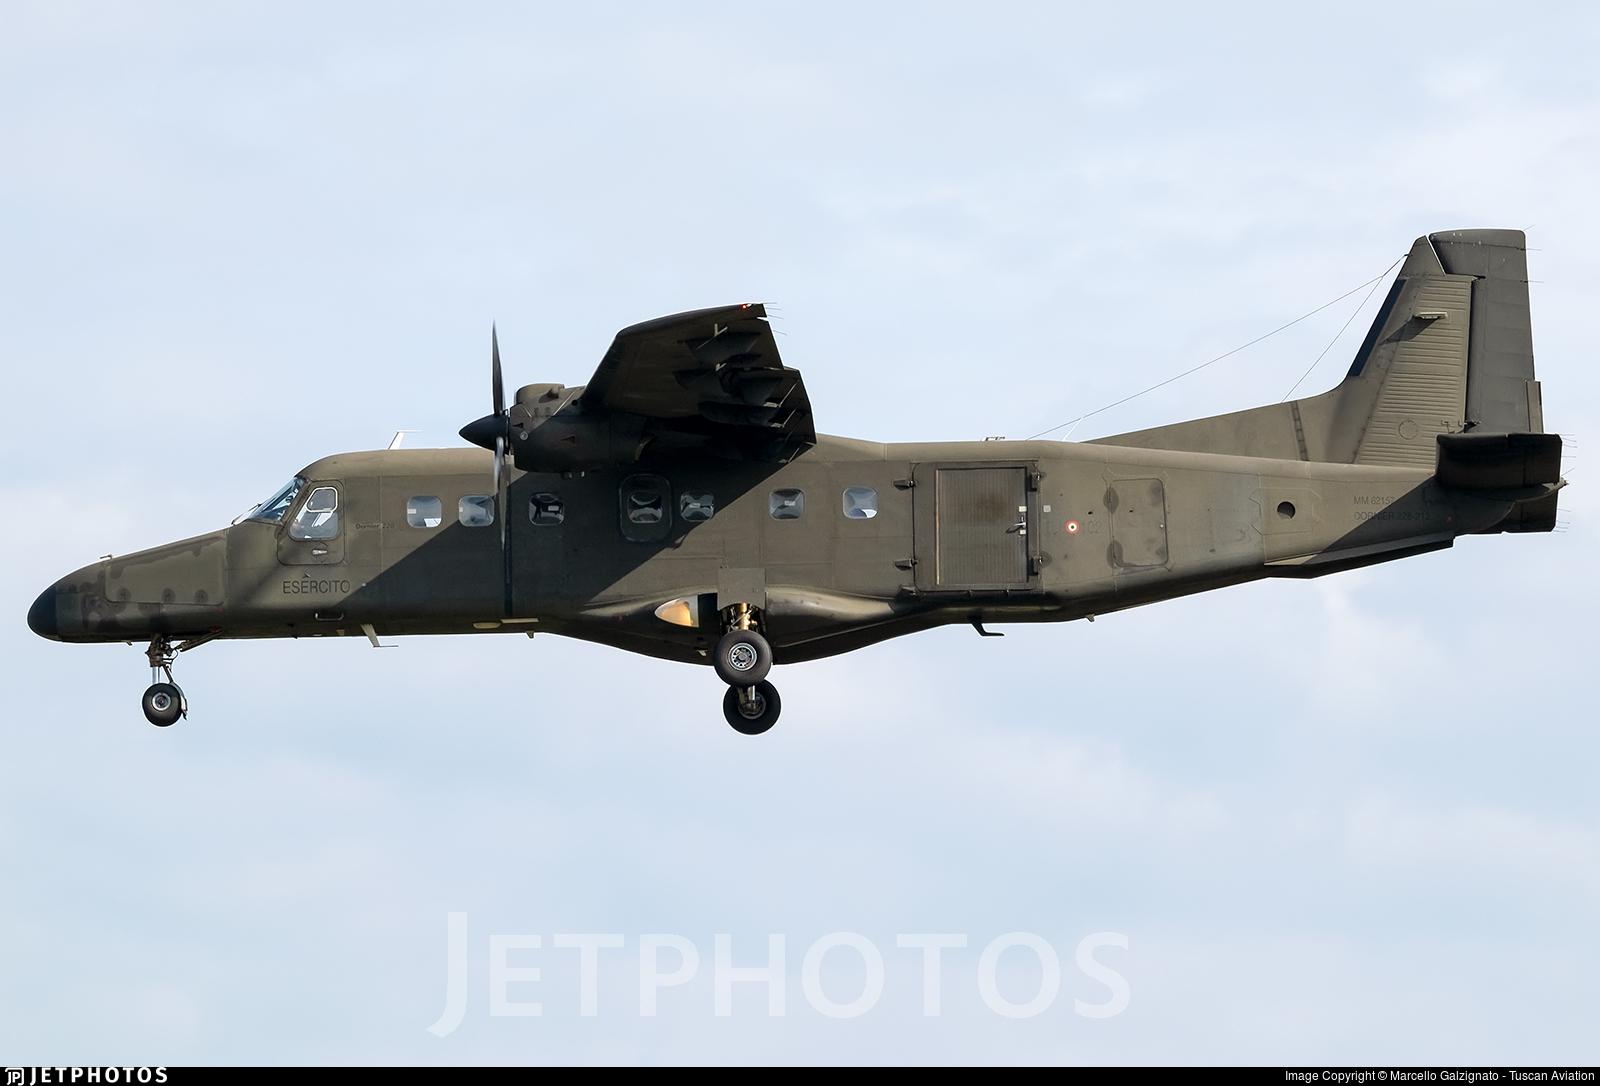 MM62157 - Dornier Do-228-212 - Italy - Army